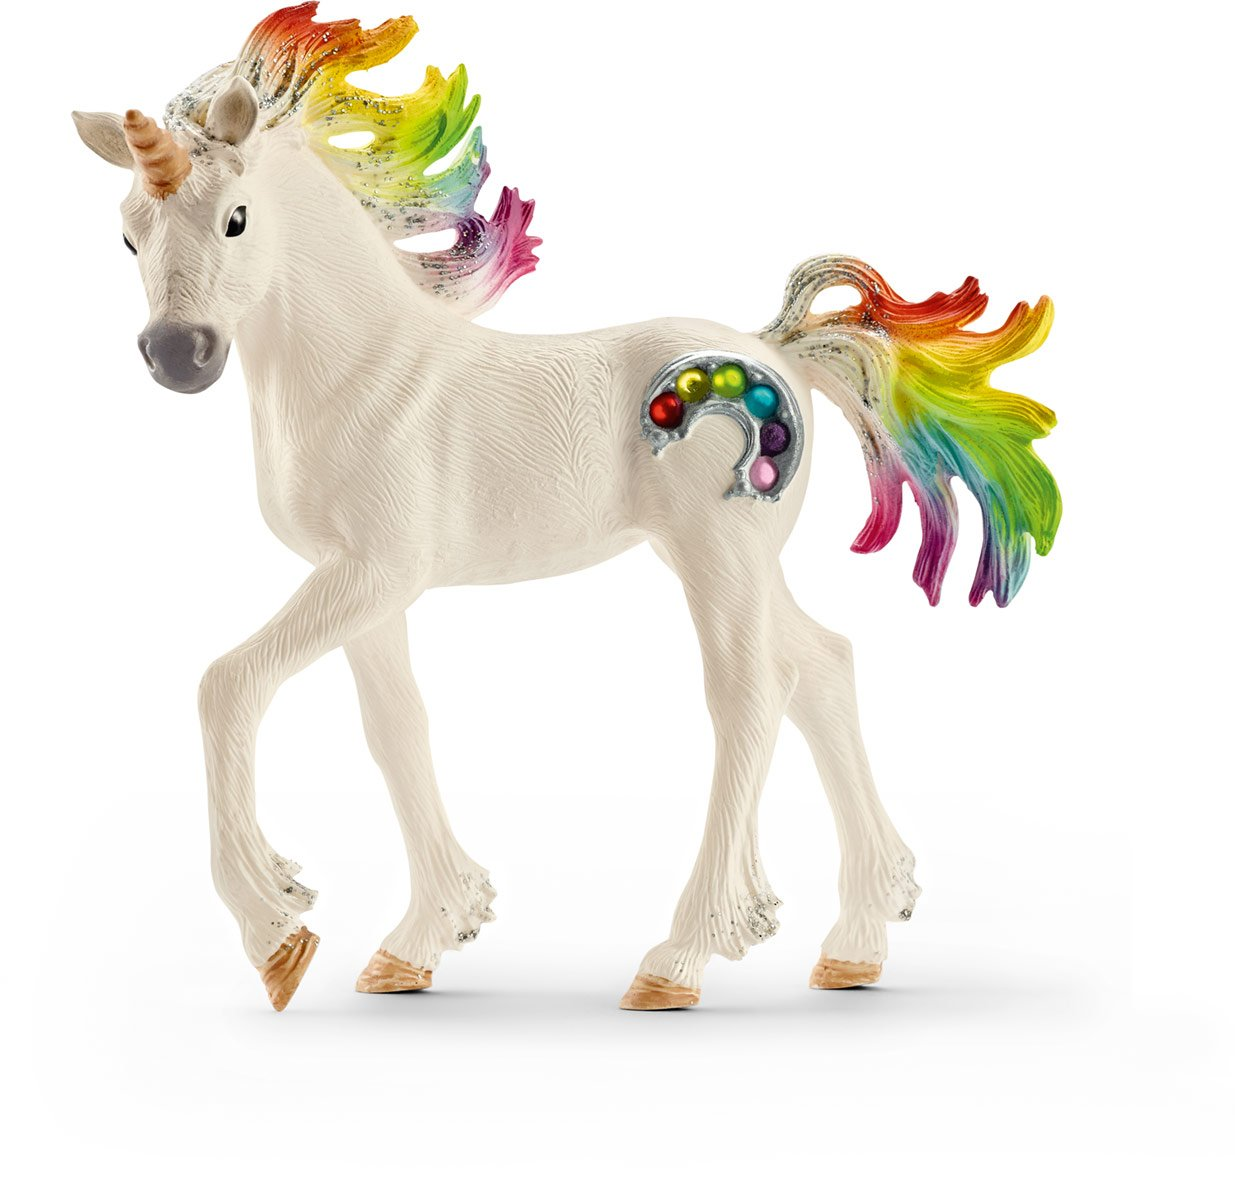 SCHLEICH bayala Rainbow Unicorn Foal Imaginative Toy for Kids Ages 5-12 3